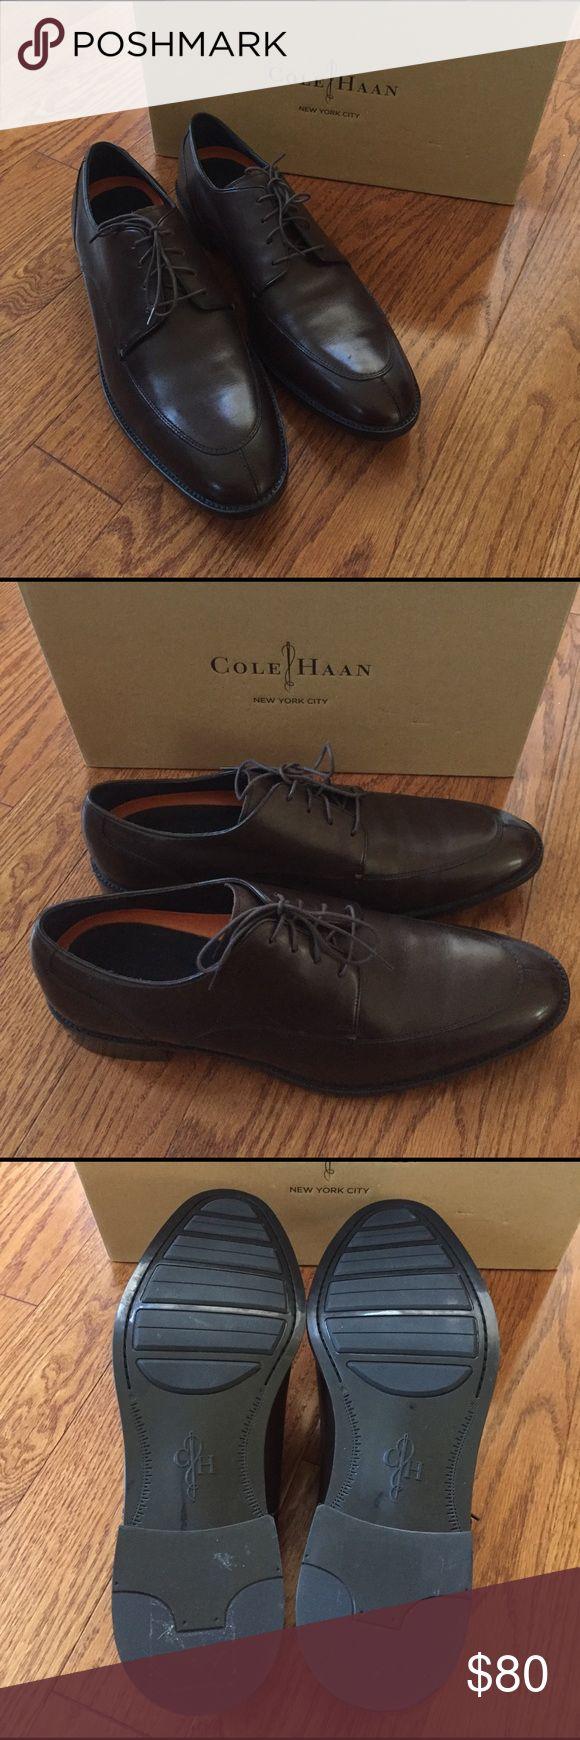 Cole Haan dress shoes NWOT Beautiful Cole Haan men's dress shoe. Deep chocolate brown. NWOT comes in original box. Cole Haan Shoes